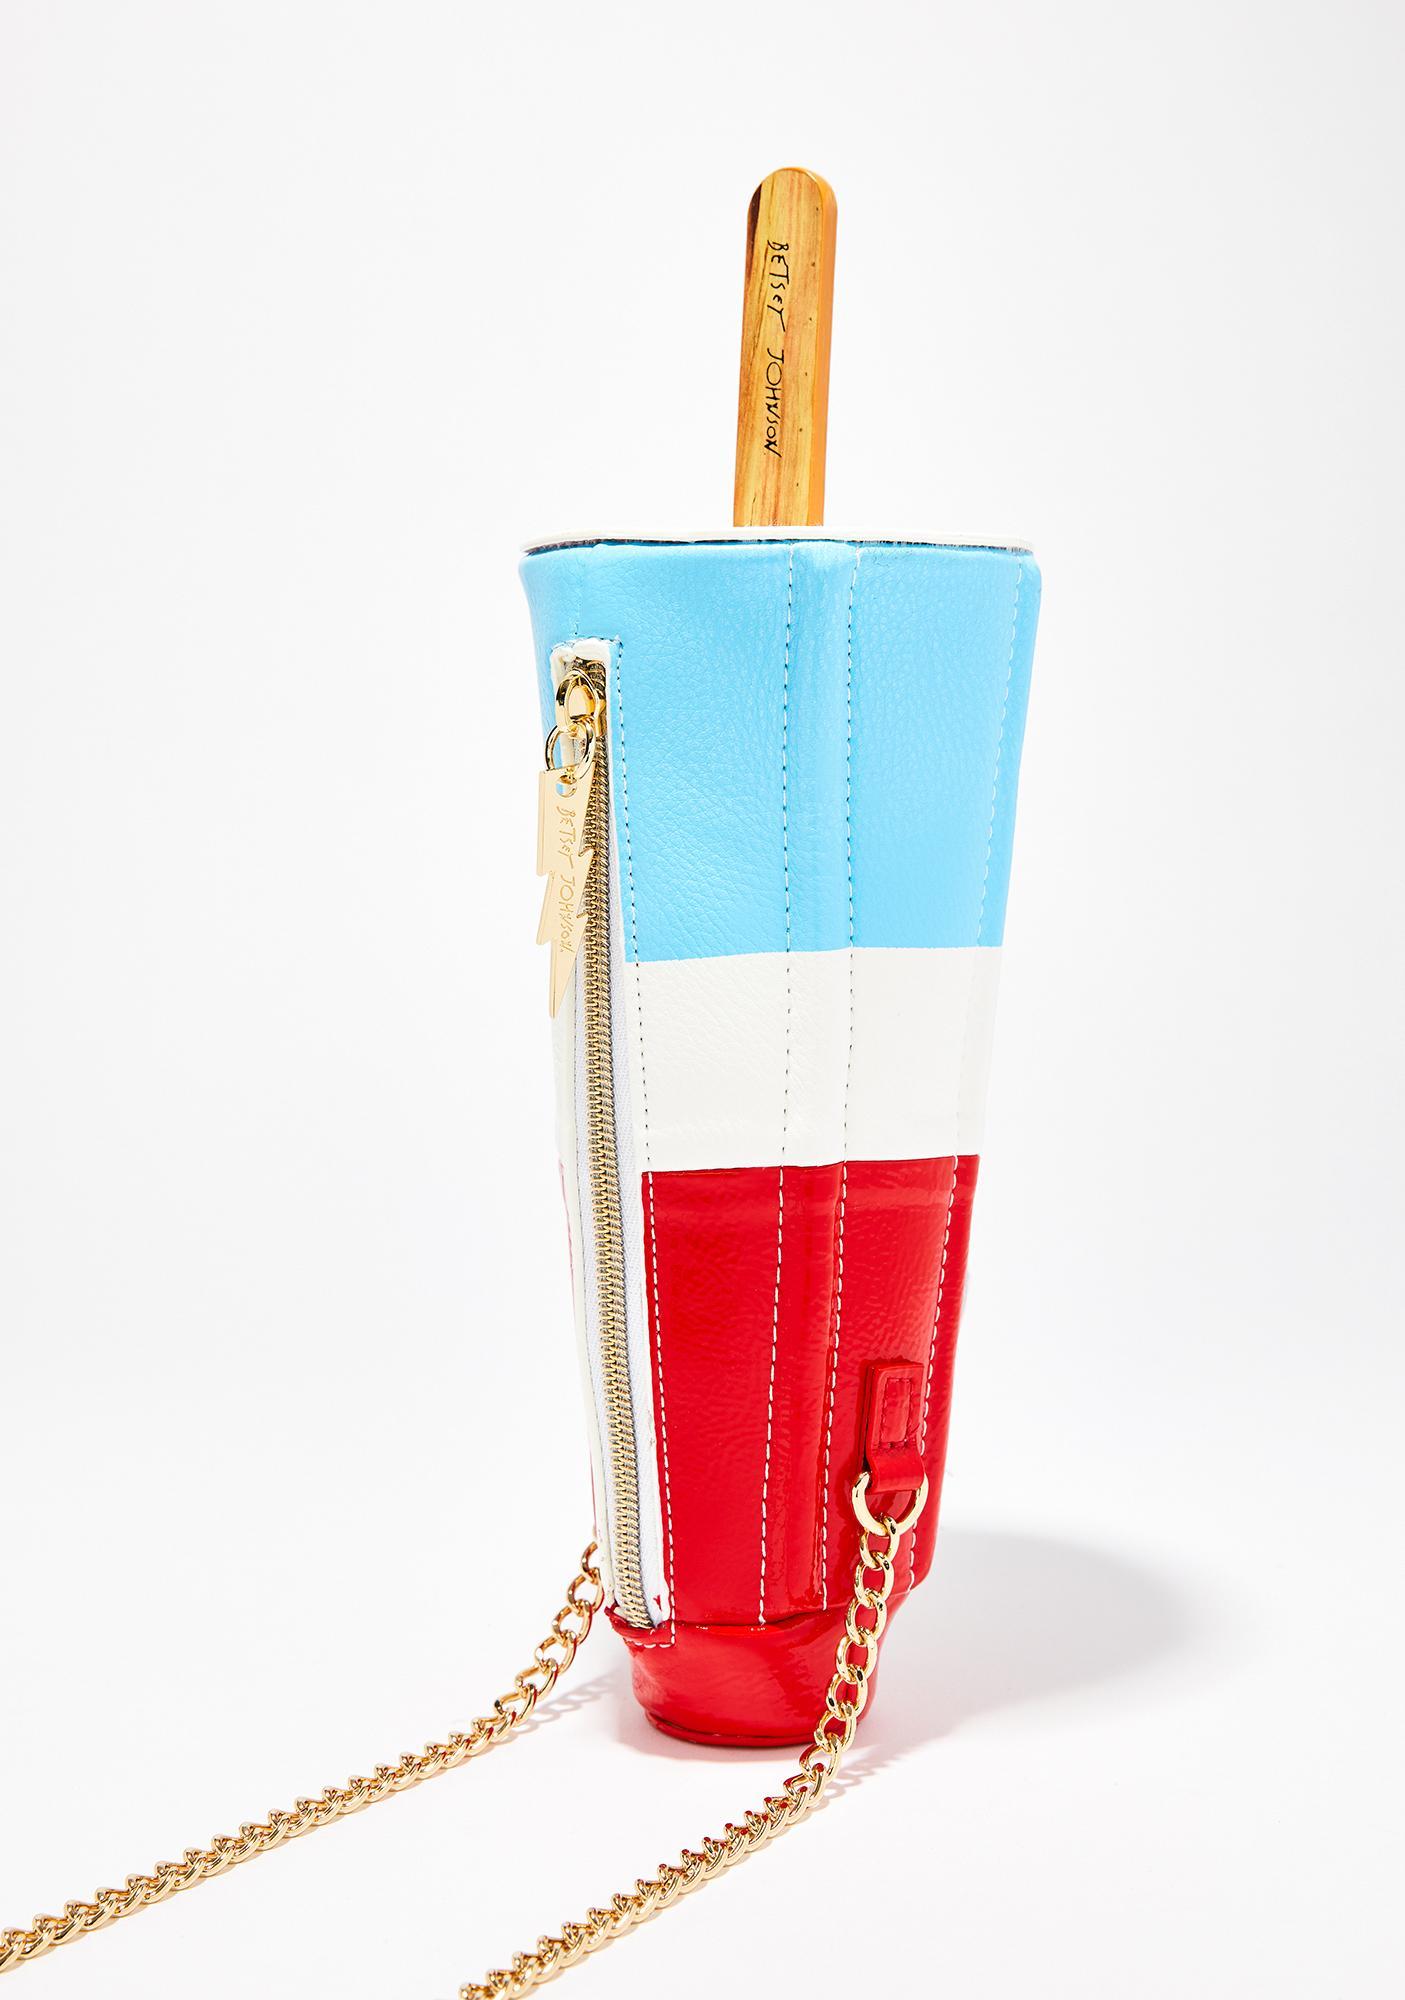 Betsey Johnson Kitsch Rocket Pop Crossbody